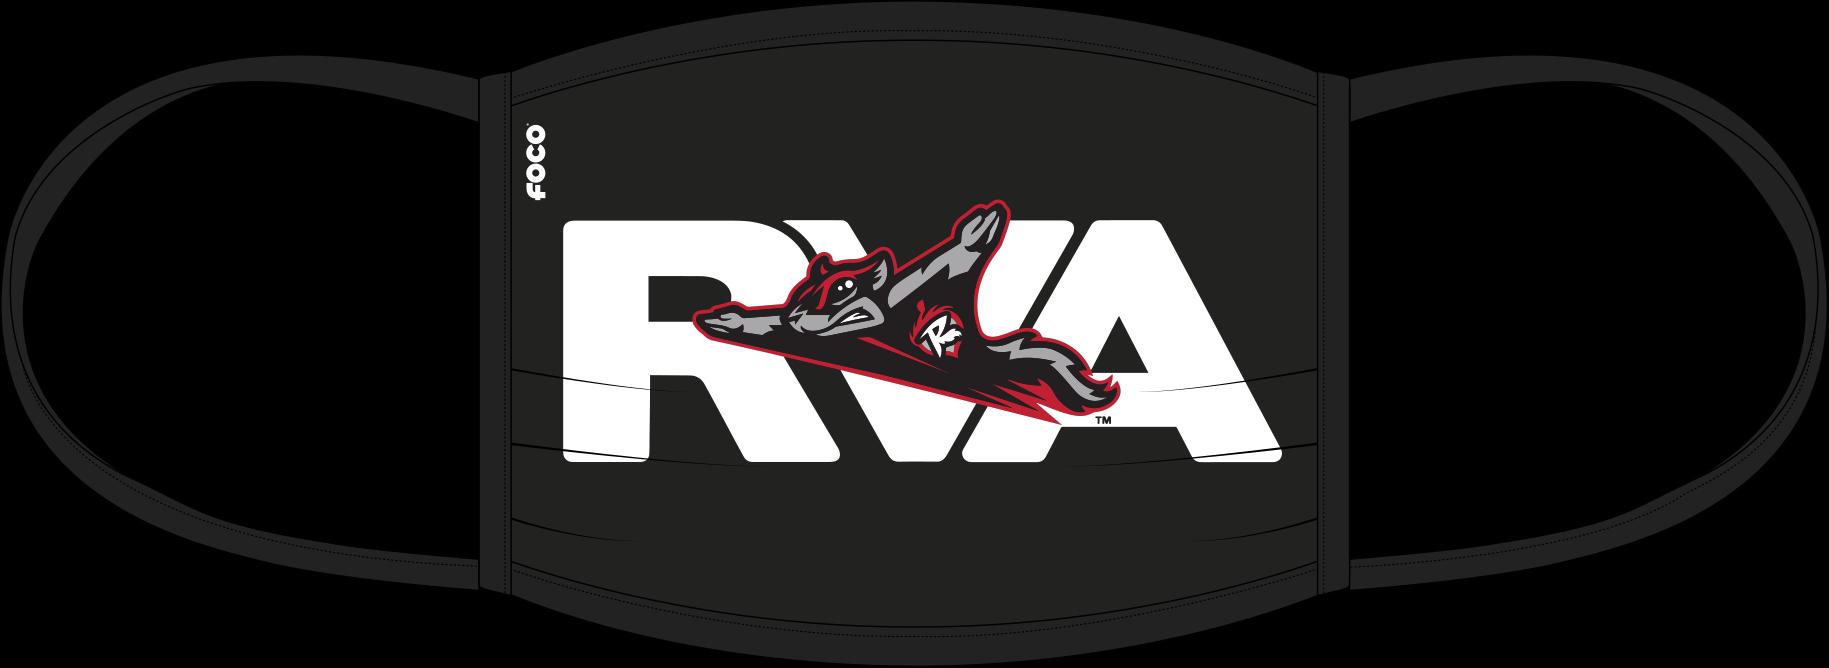 RVA Mask